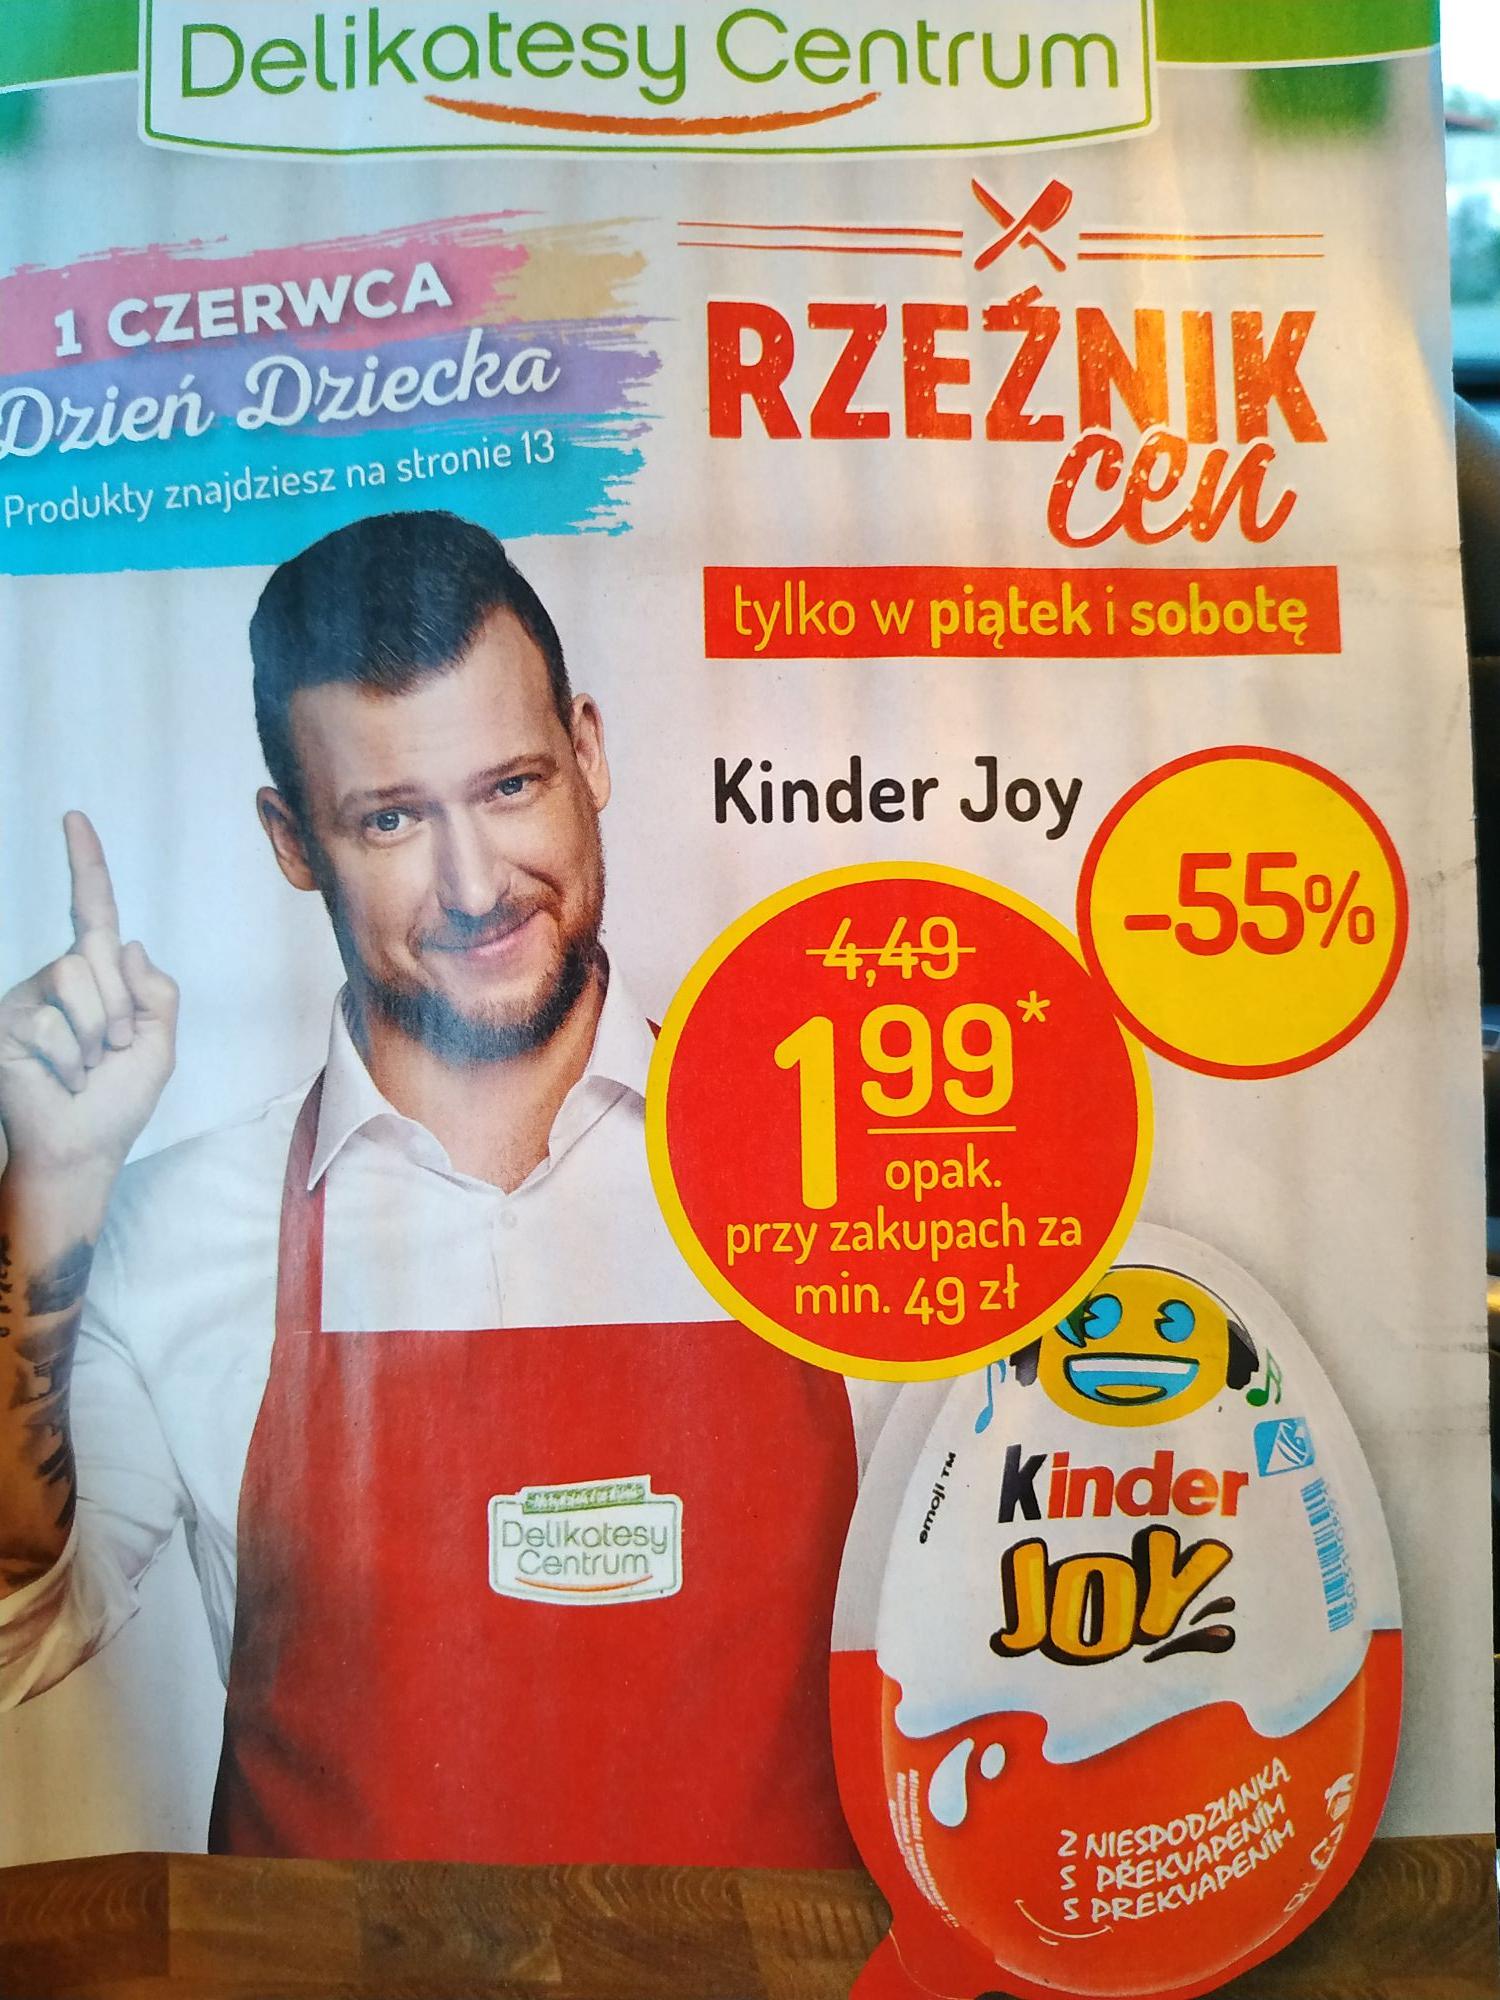 Kinder Joy oferta Delikatesy Centrum